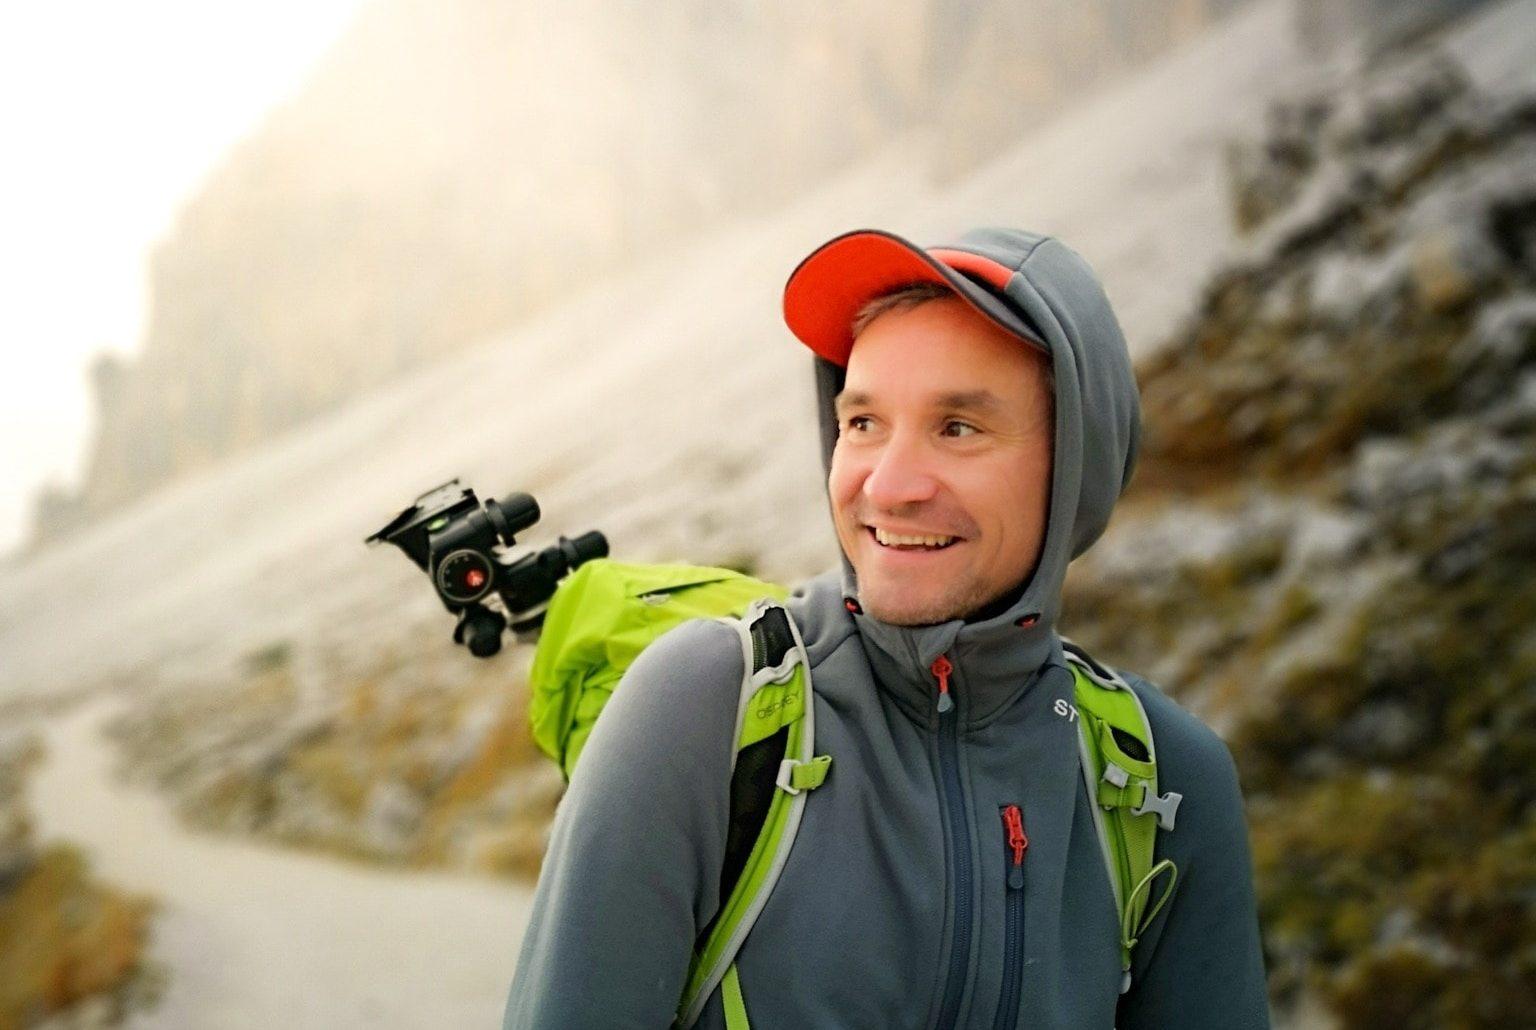 Interview with photographer Arild Heitmann (arildheitmannphotography)